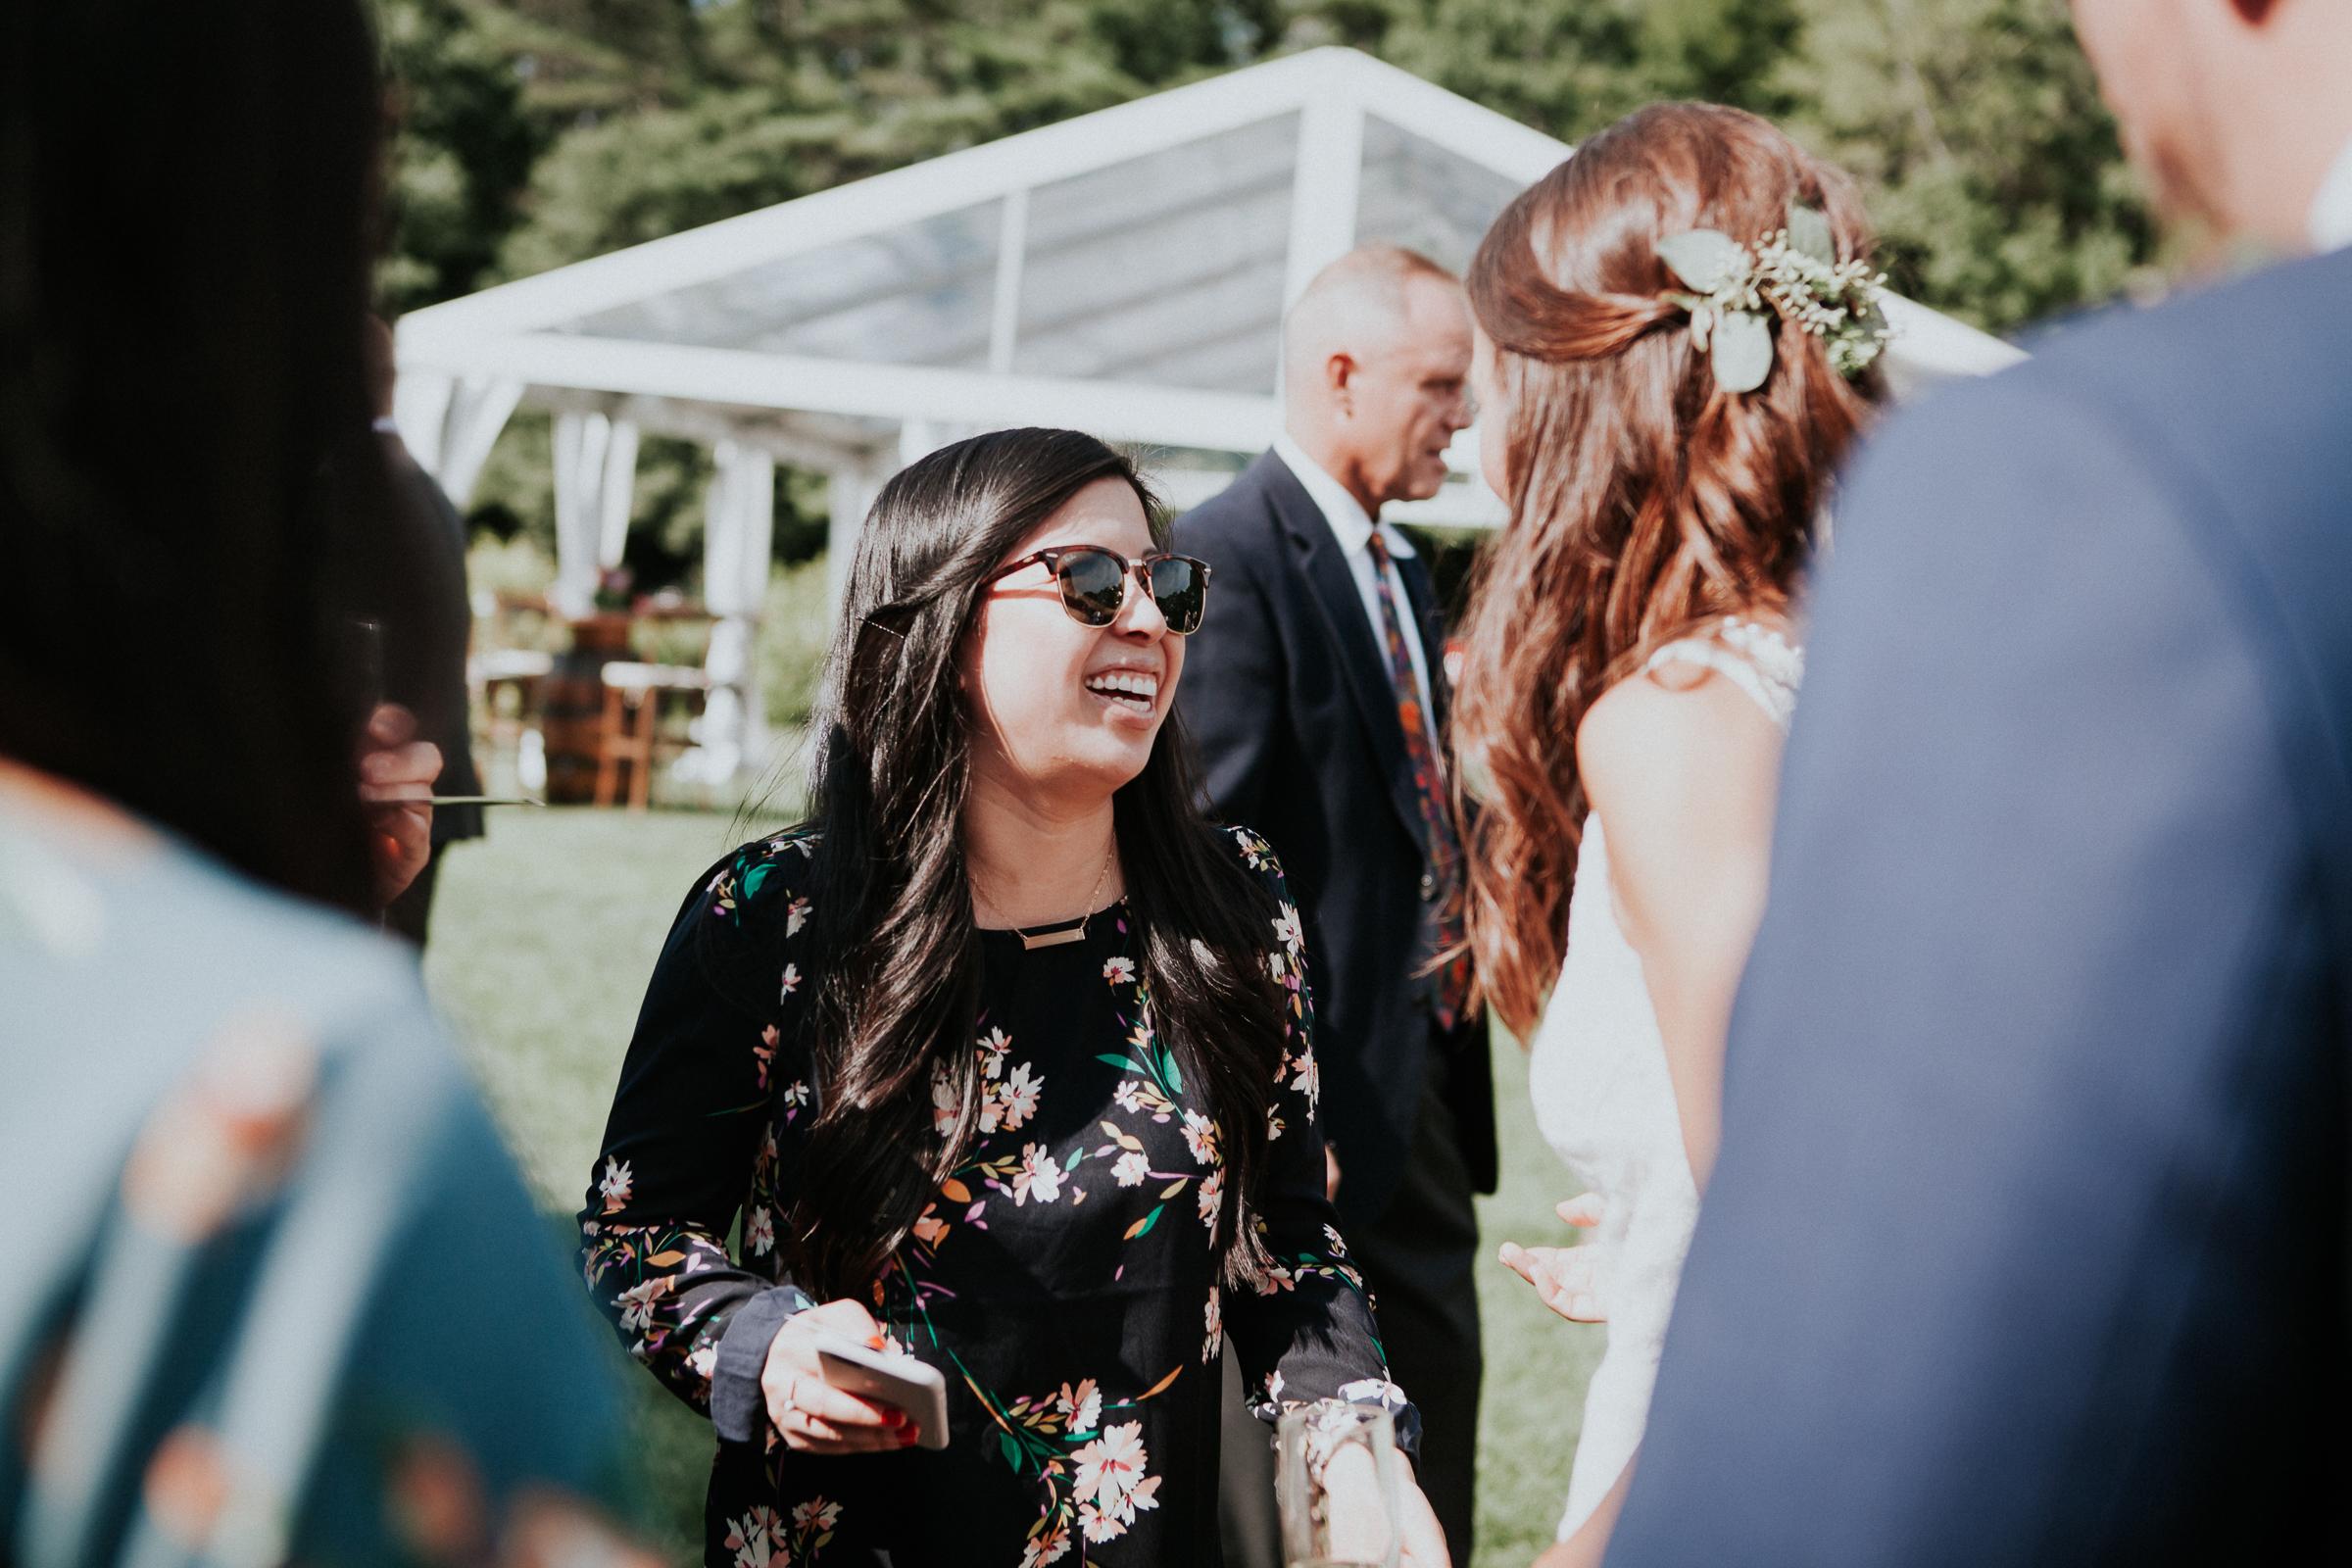 Marianmade-Farm-Wiscasset-Maine-Fine-Art-Documentary-Wedding-Photographer-Elvira-Kalviste-Photography-94.jpg